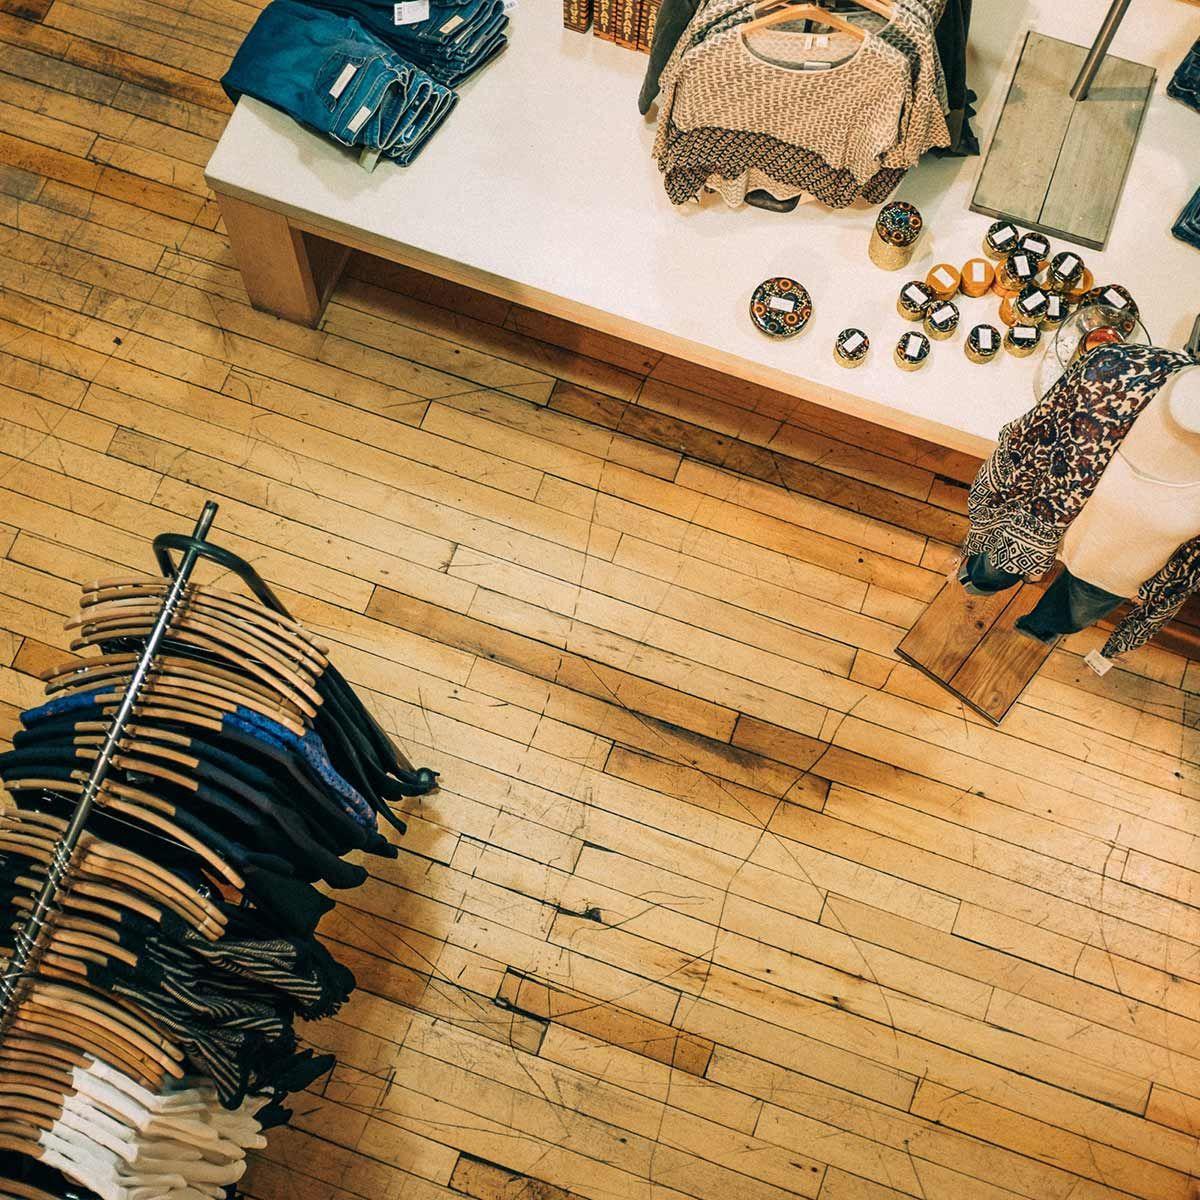 acacia_shopping.jpg